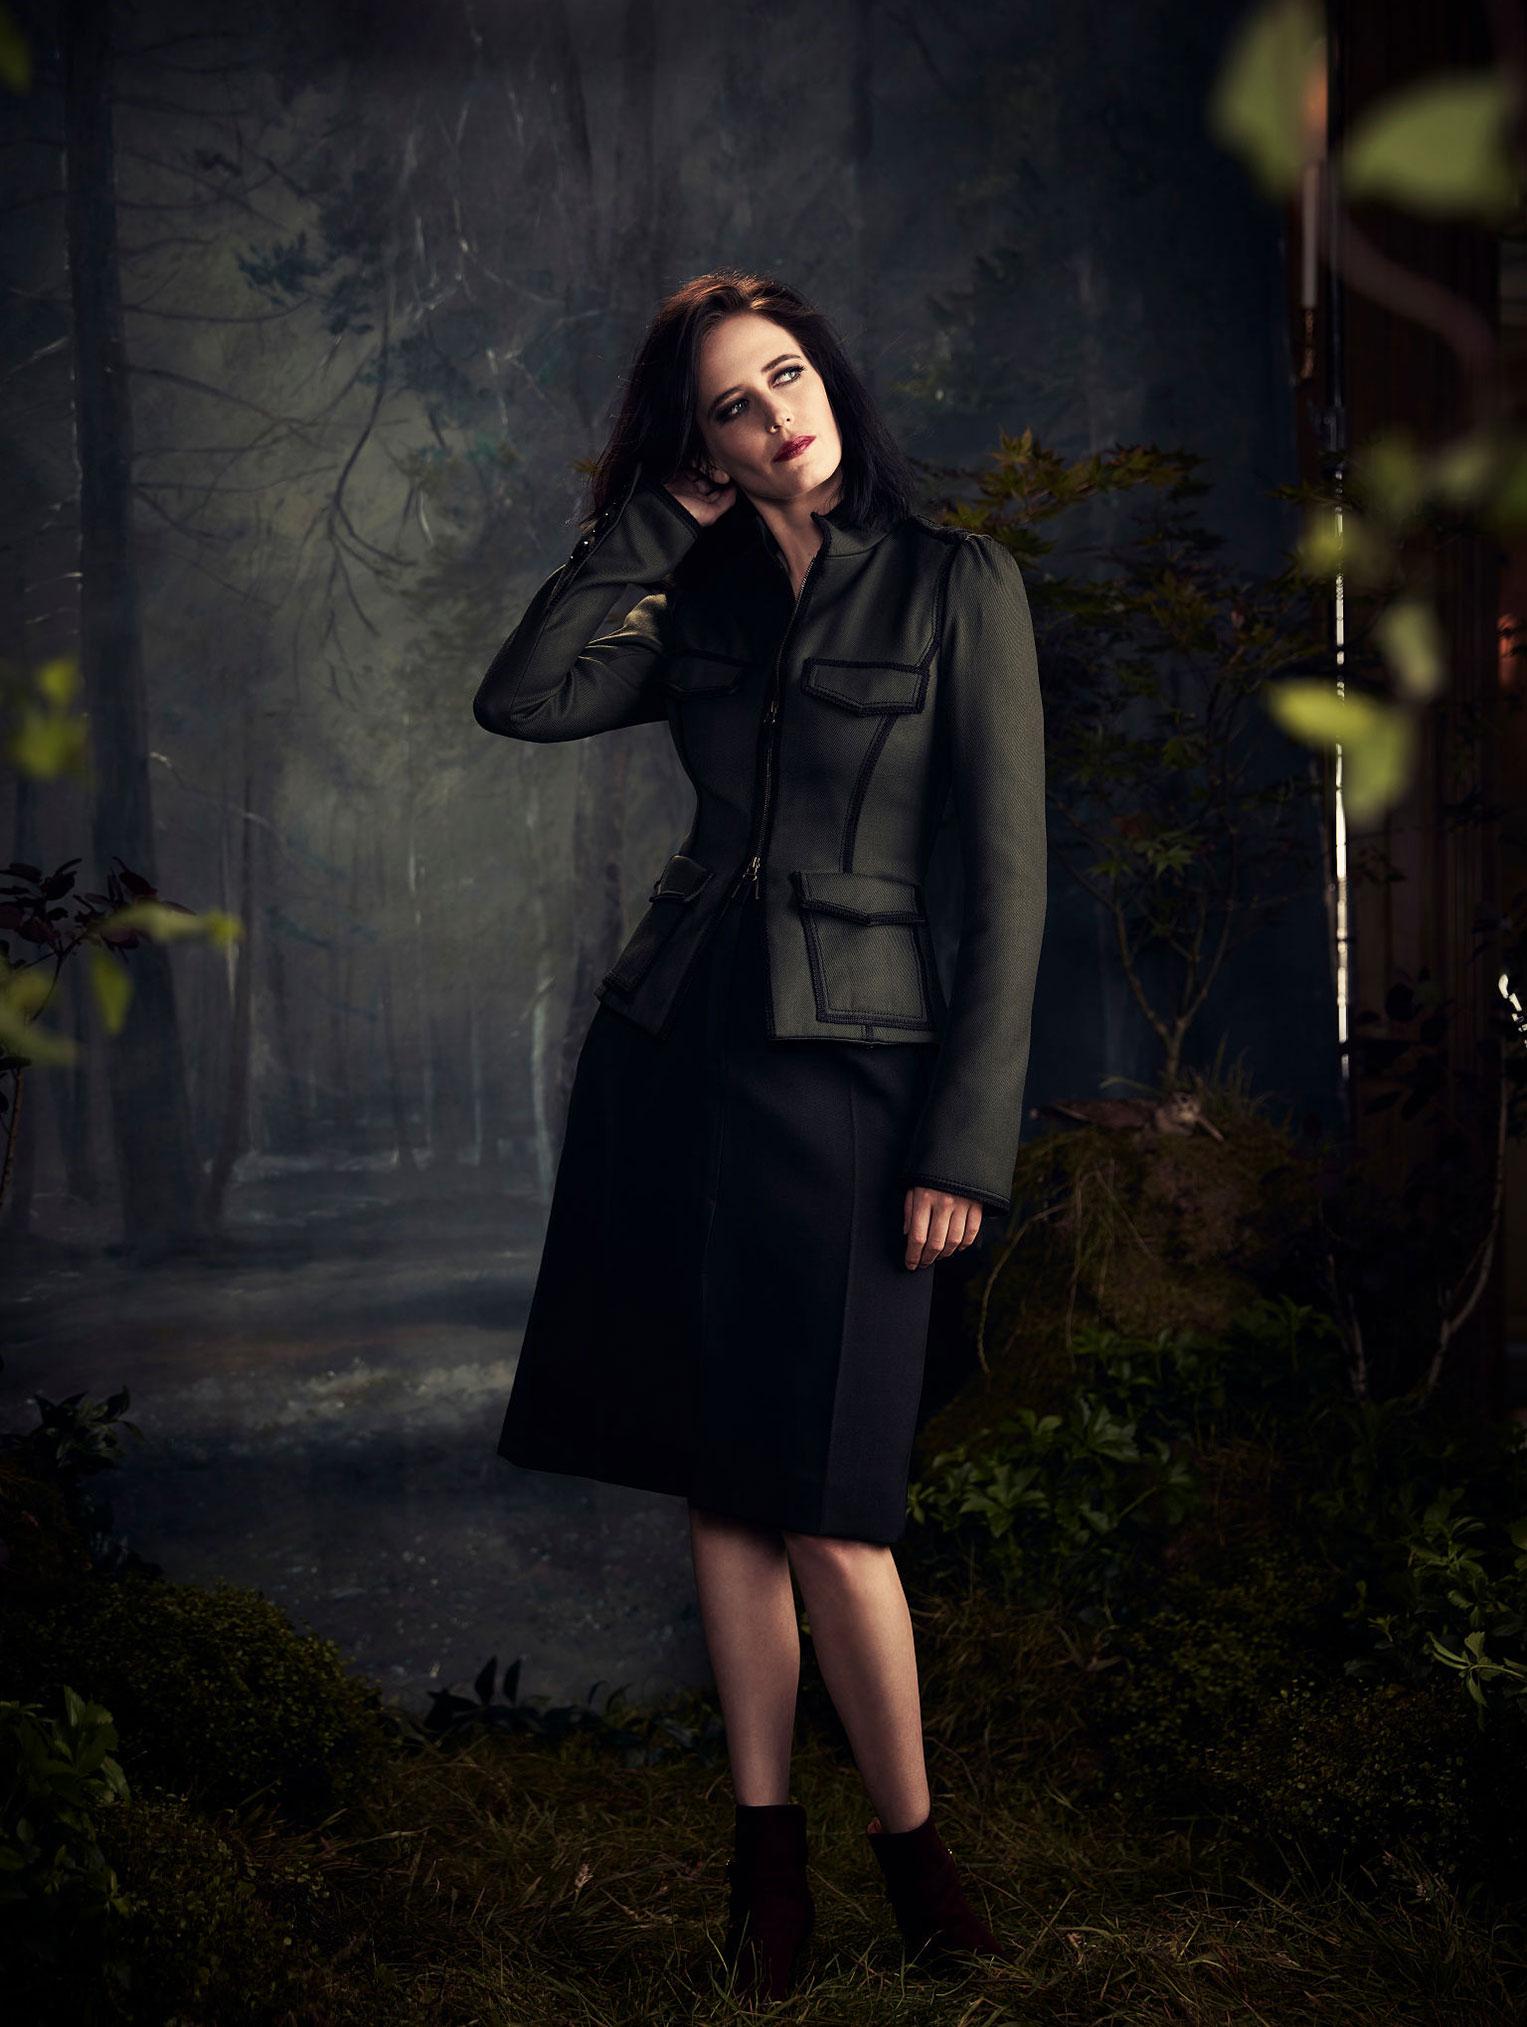 промосъемка Евы Грин для киностудии 20th Century Fox / фото 13